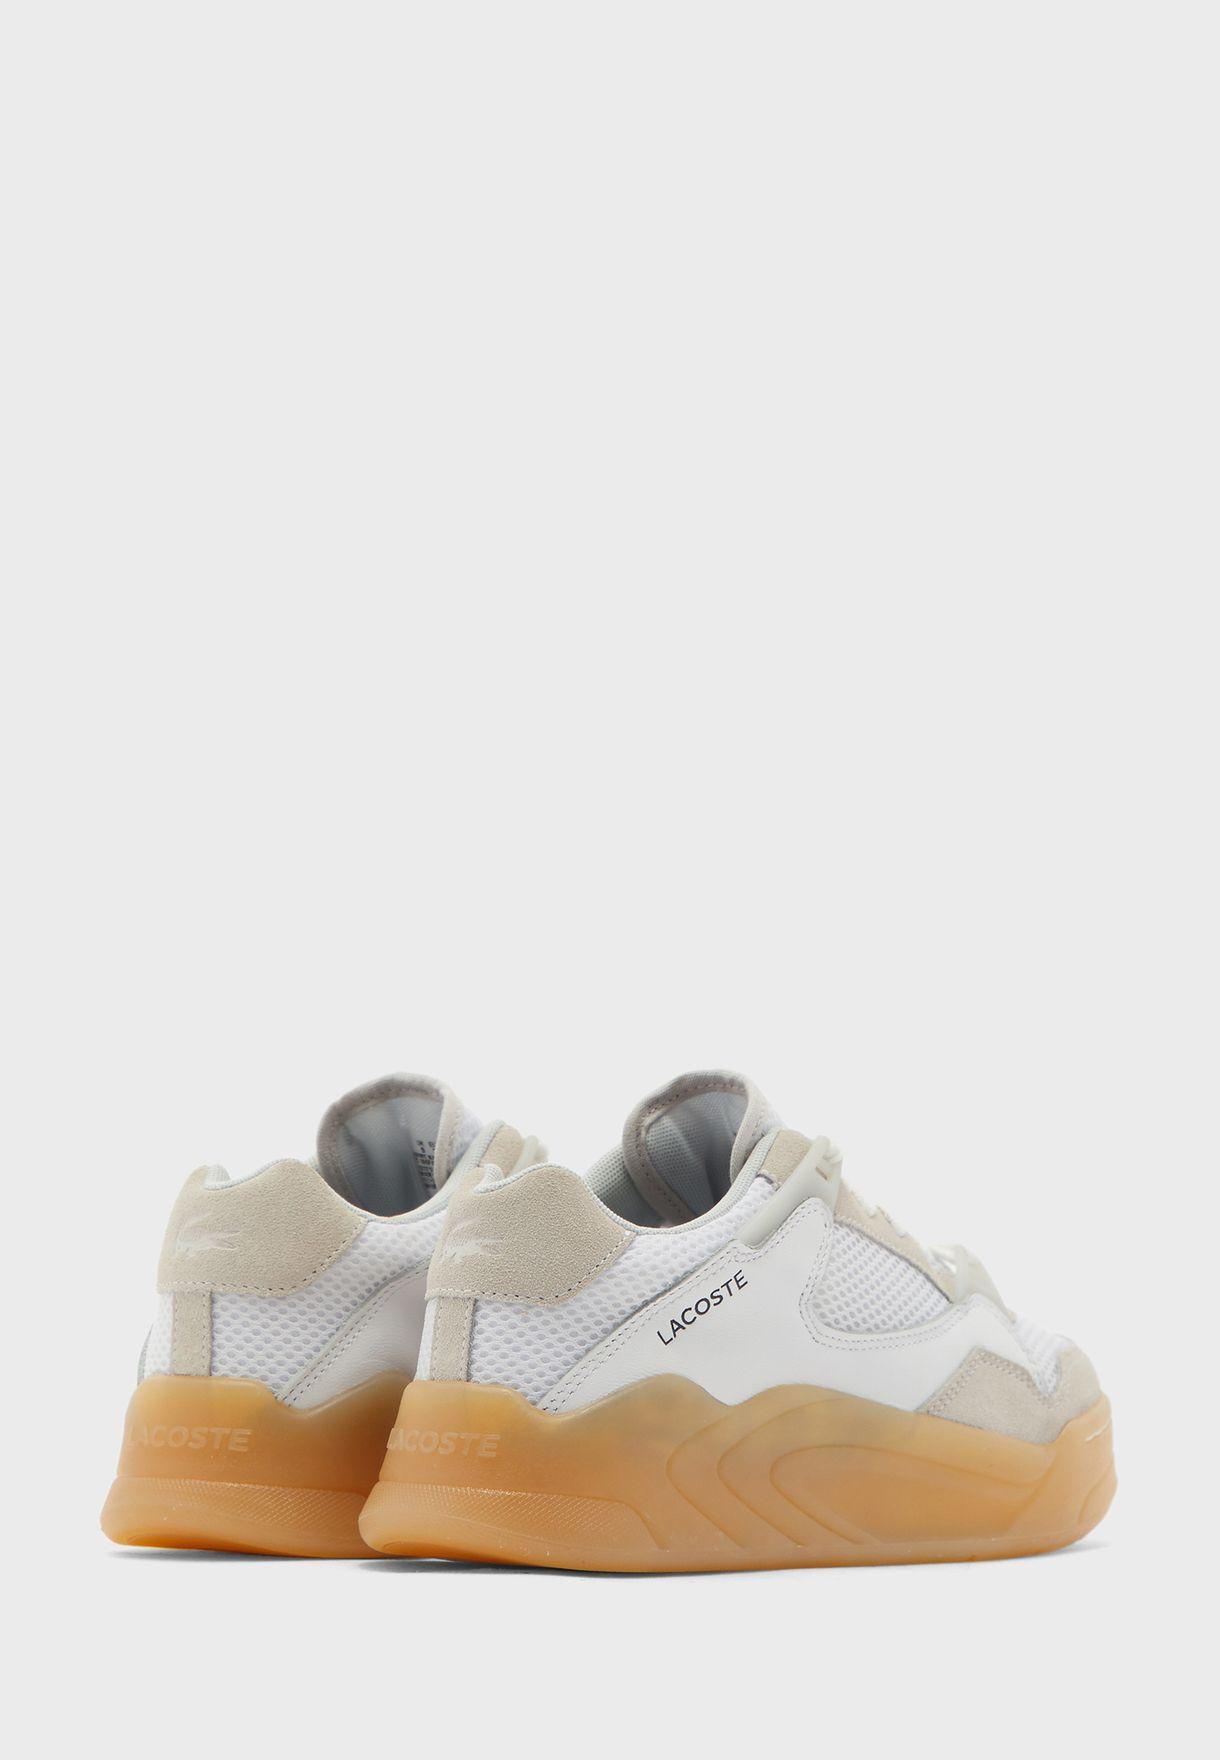 Court Slam Dynamic Low-Top Sneakers